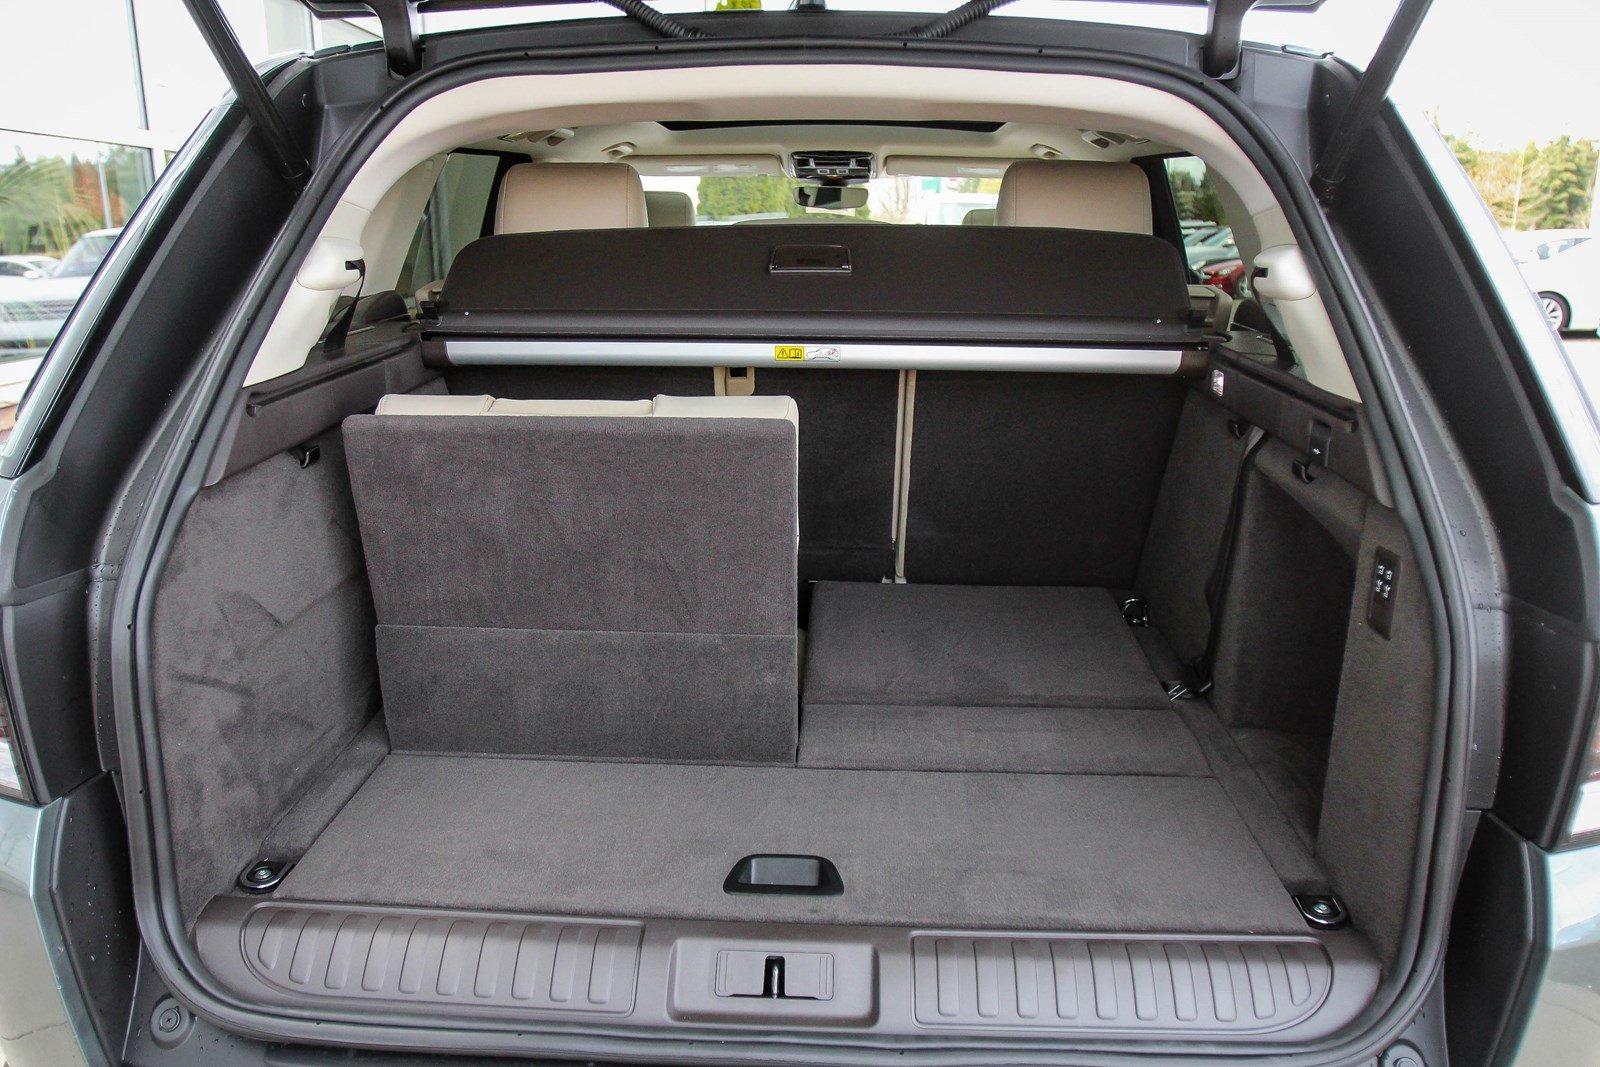 RANGE ROVER SPORT HSE 3.0 PETROL 7 SEAT